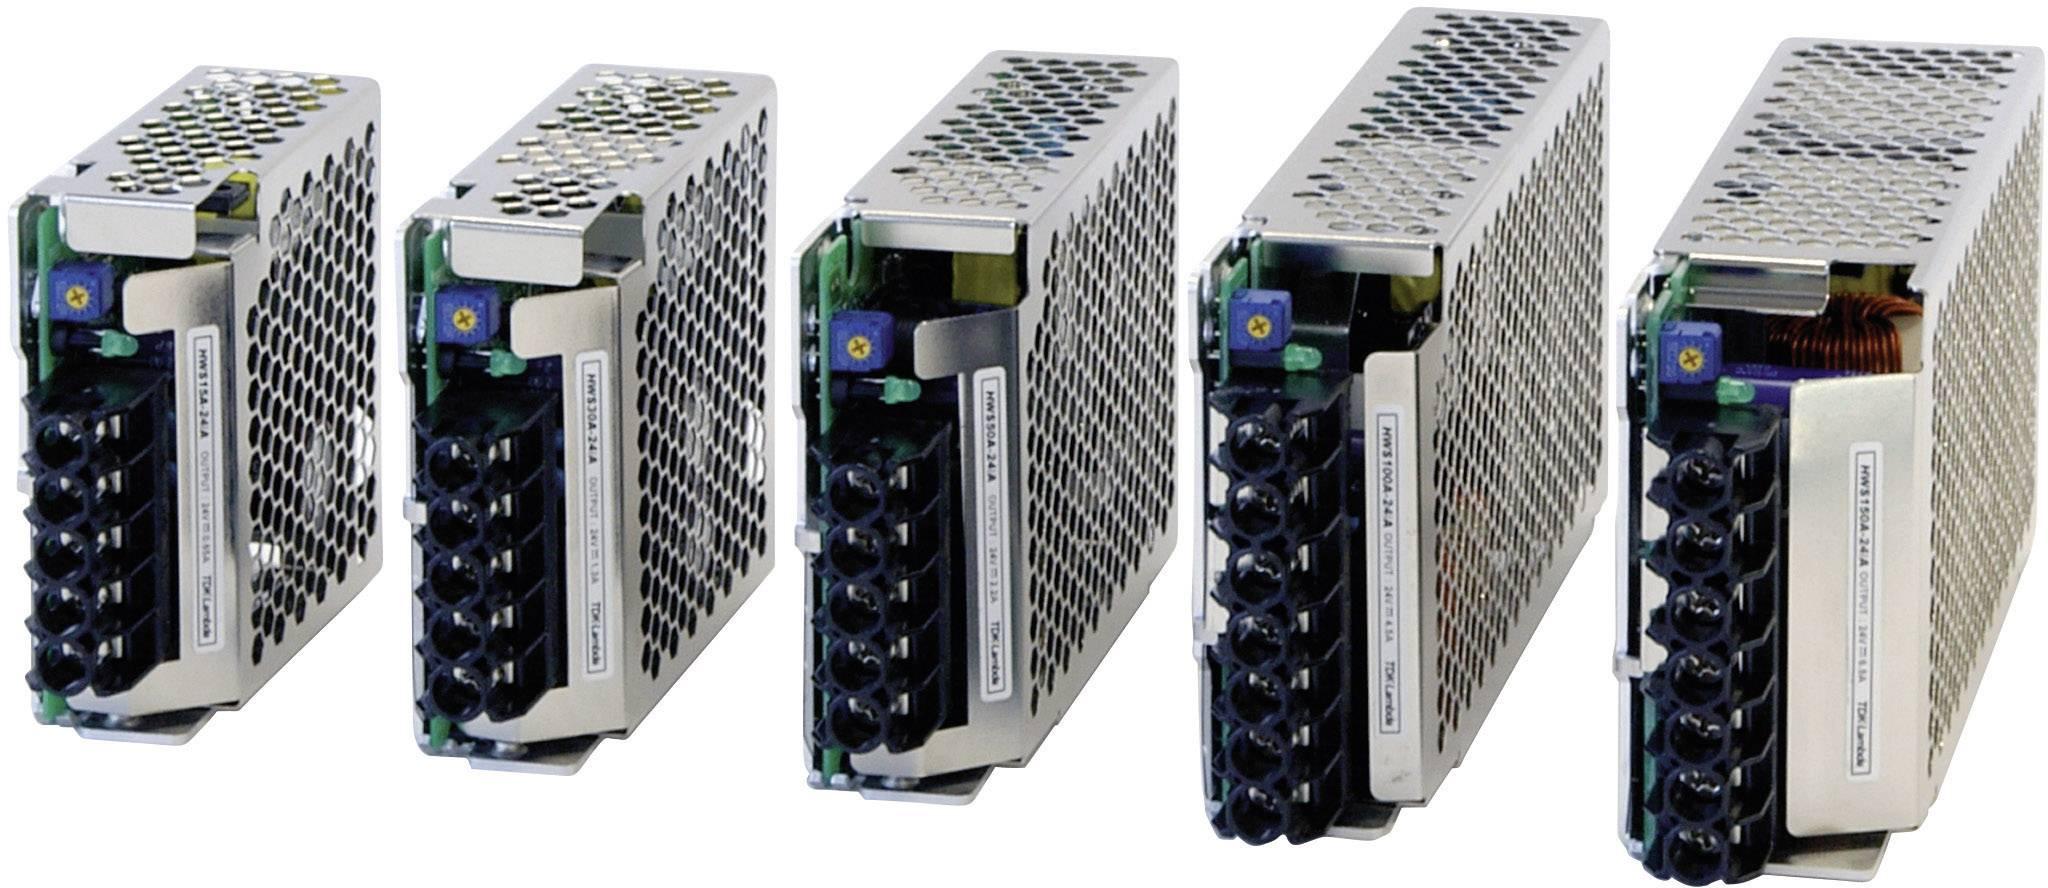 Zabudovateľný napájací zdroj TDK-Lambda HWS-150A-12, 12 V, 156 W